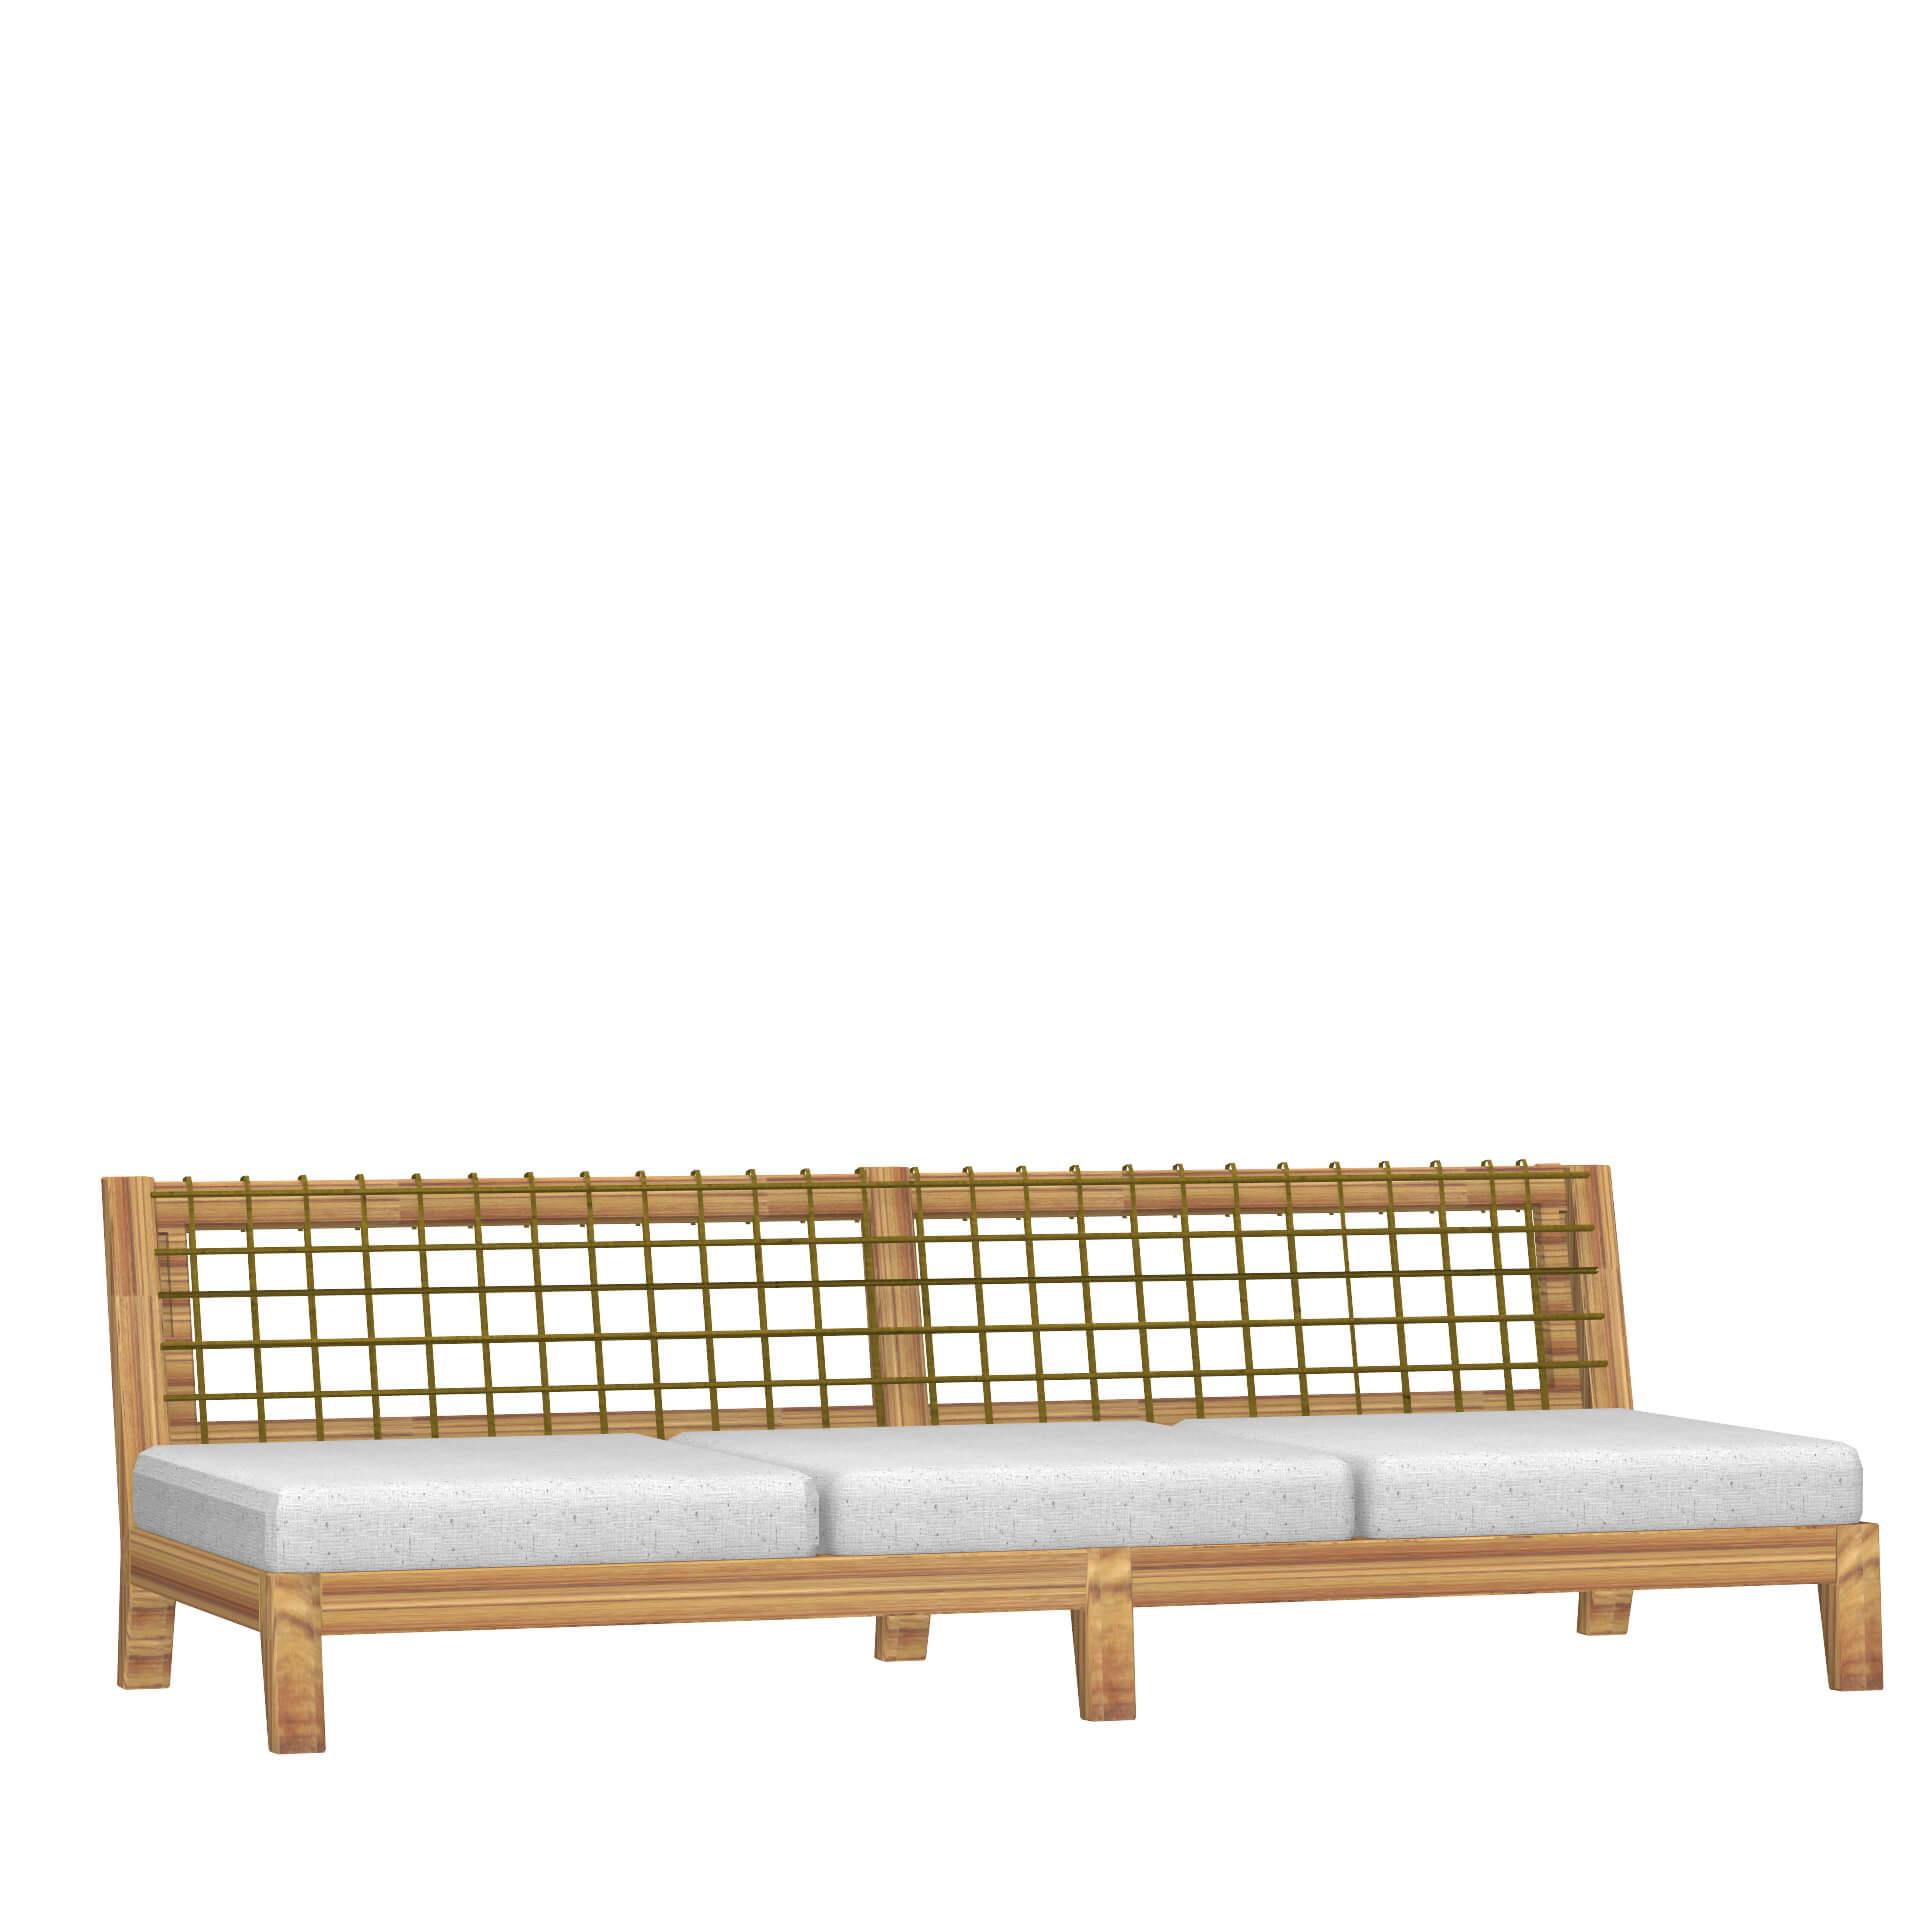 Градински диван-легло, колекция Synthesis